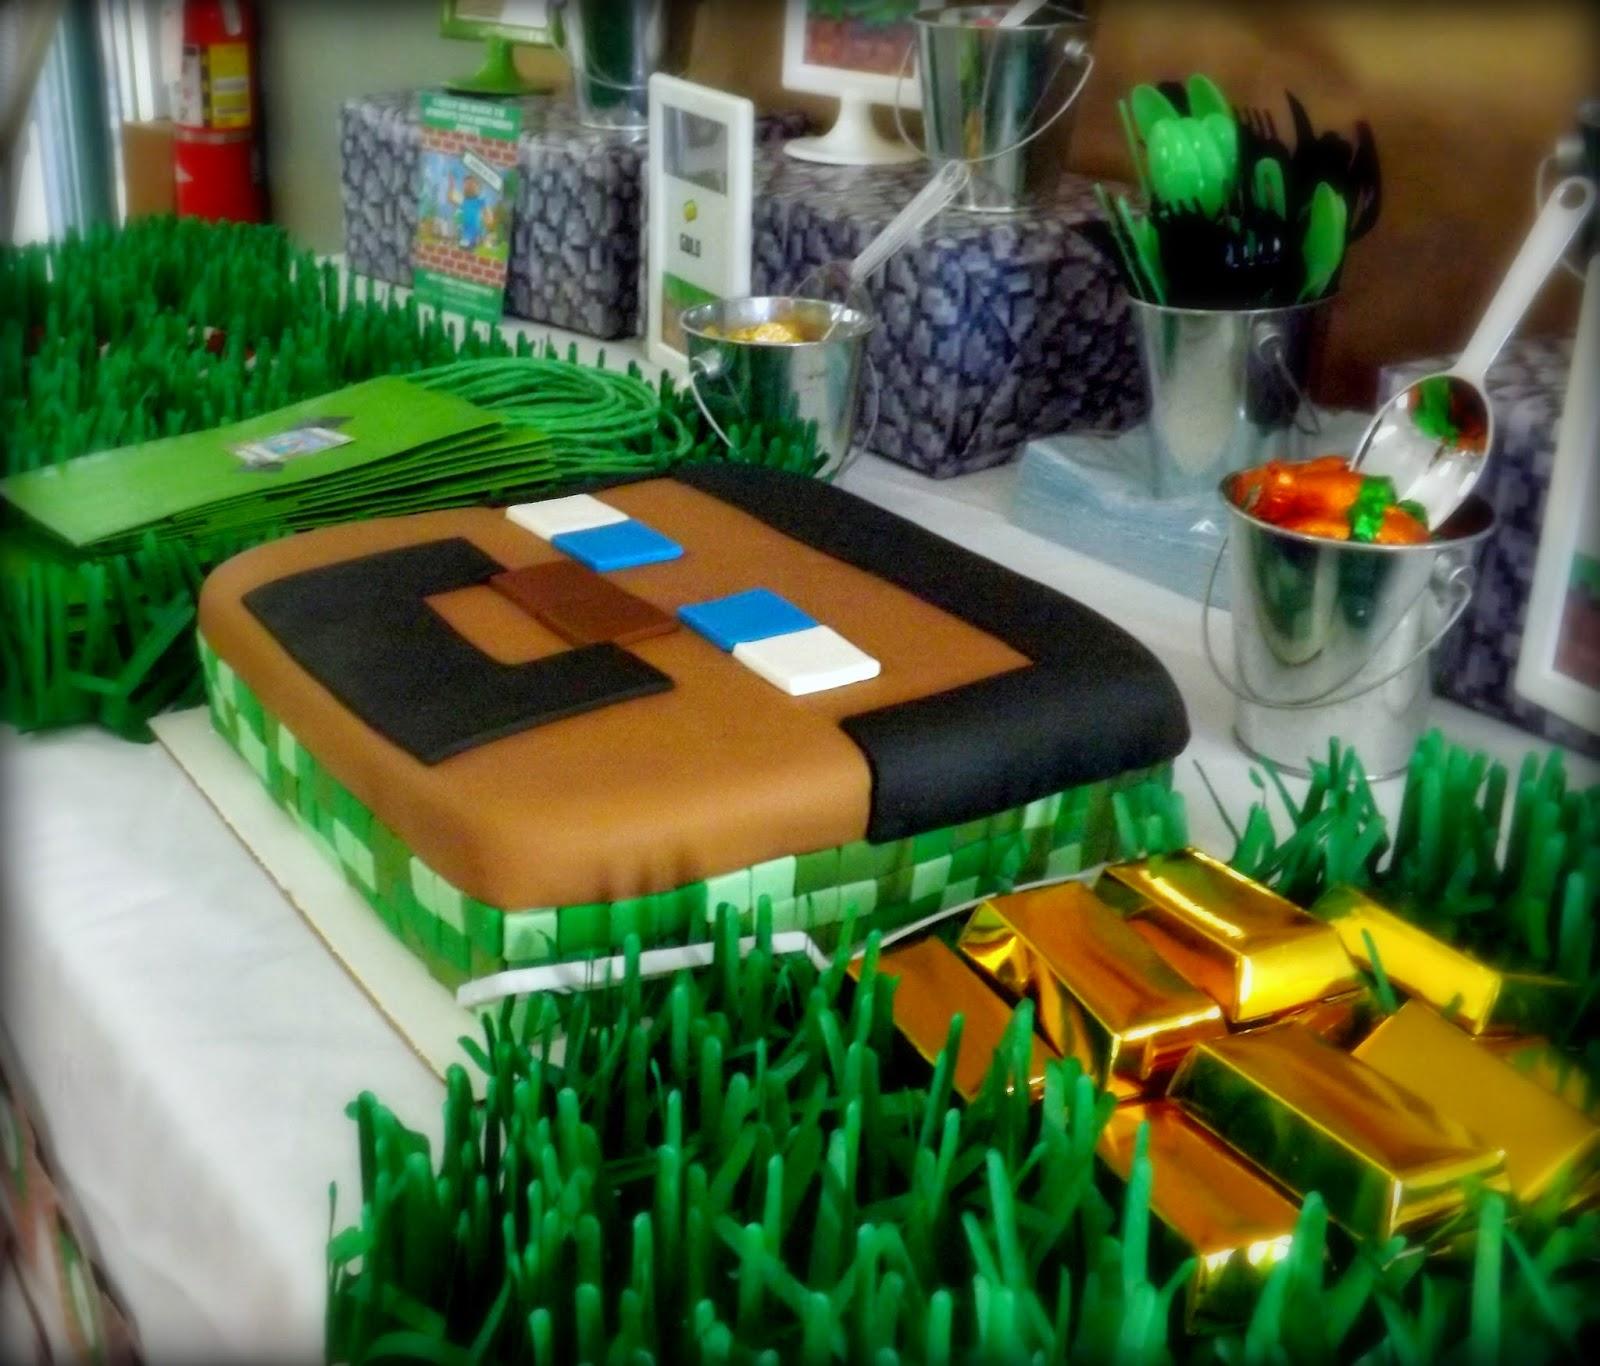 A Stylish Affair By Jessie: Minecraft Inspired Party